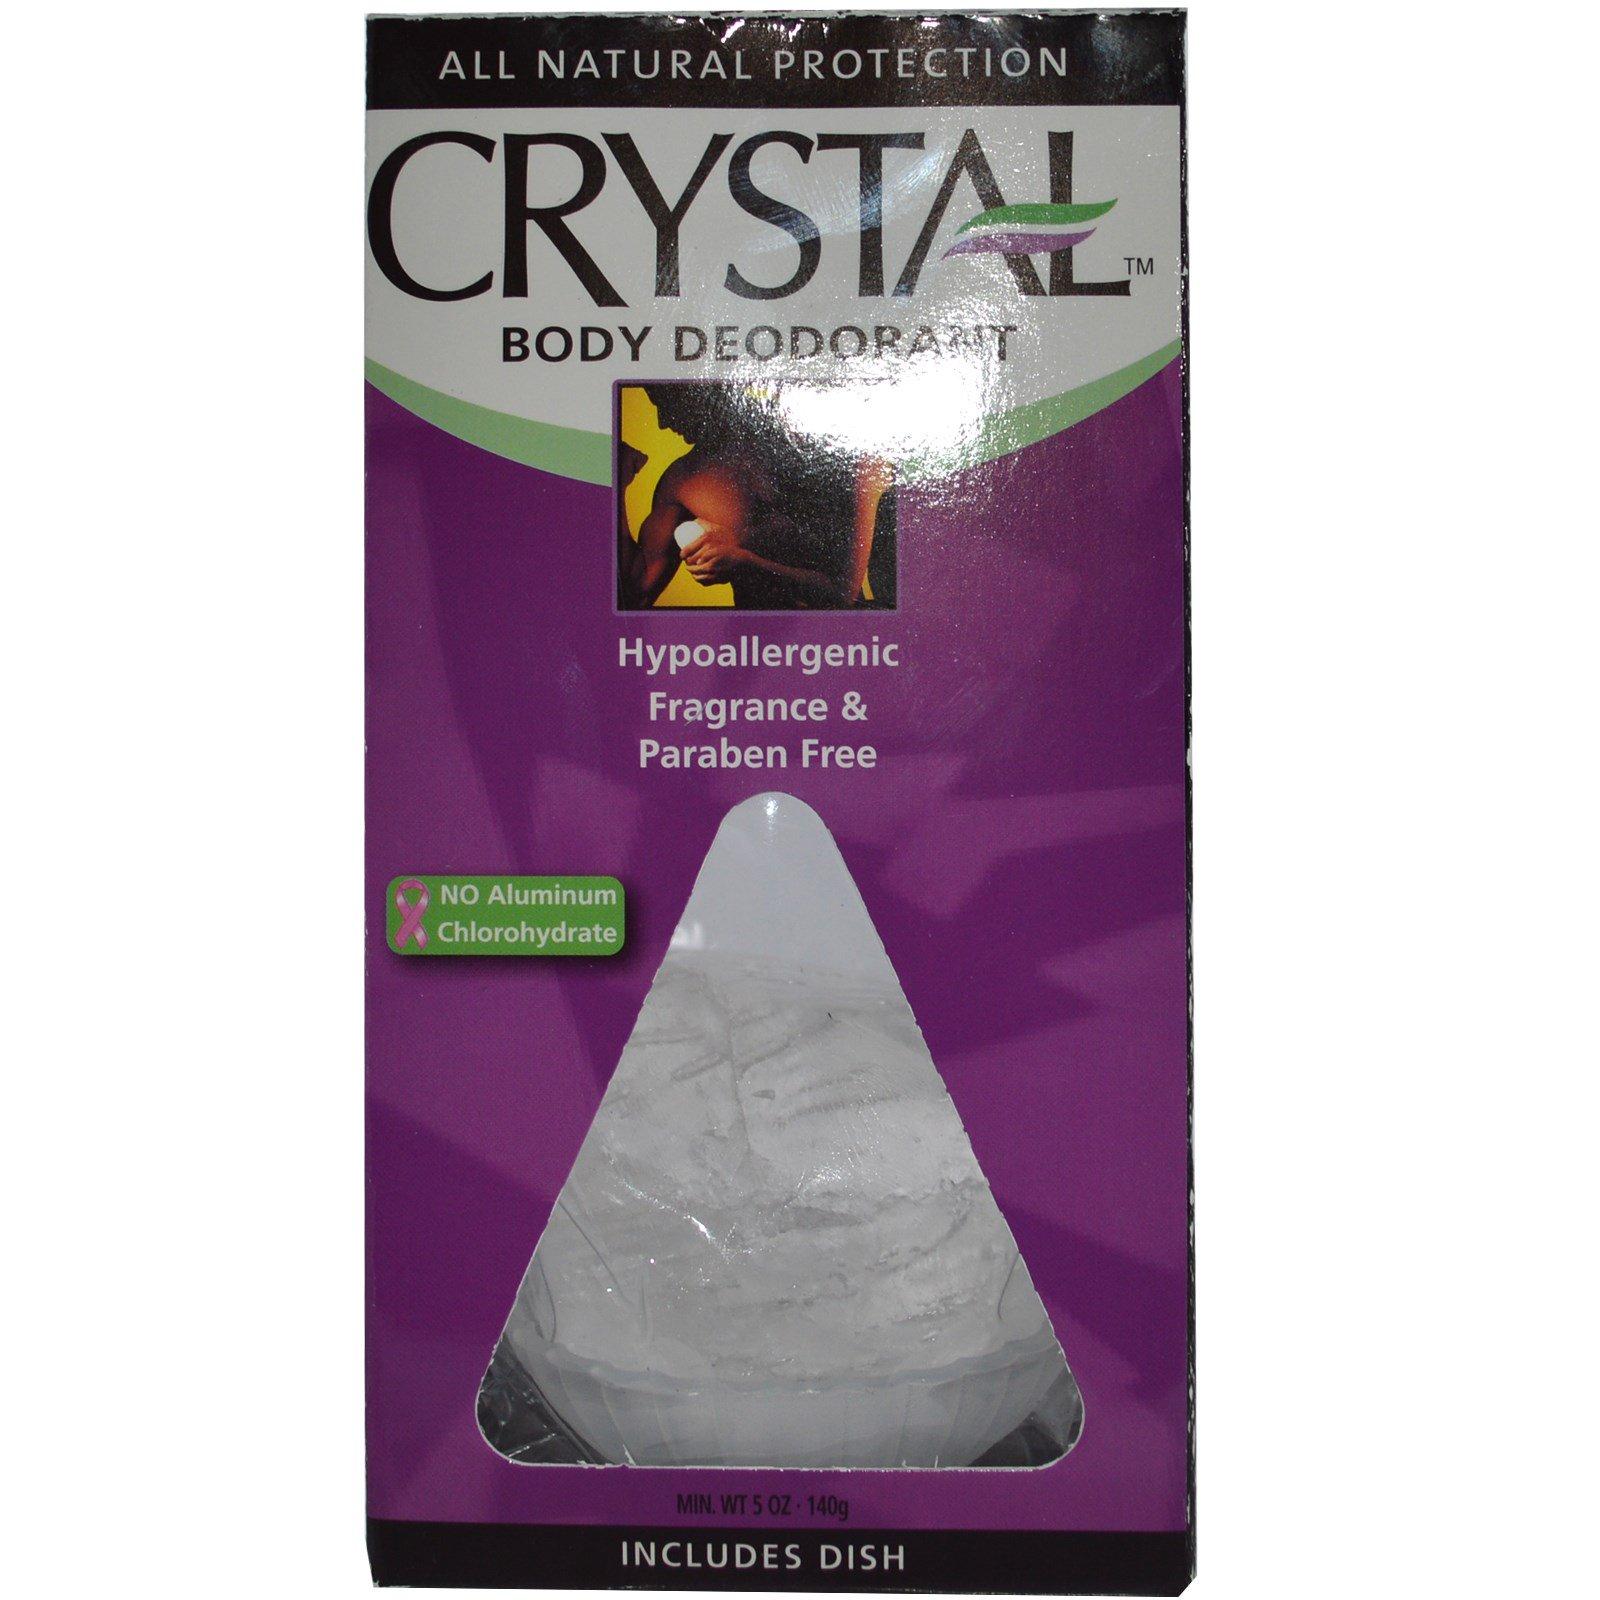 Crystal Body Deodorant, Дезодорант «Кристалл», 5 унций (140 г)